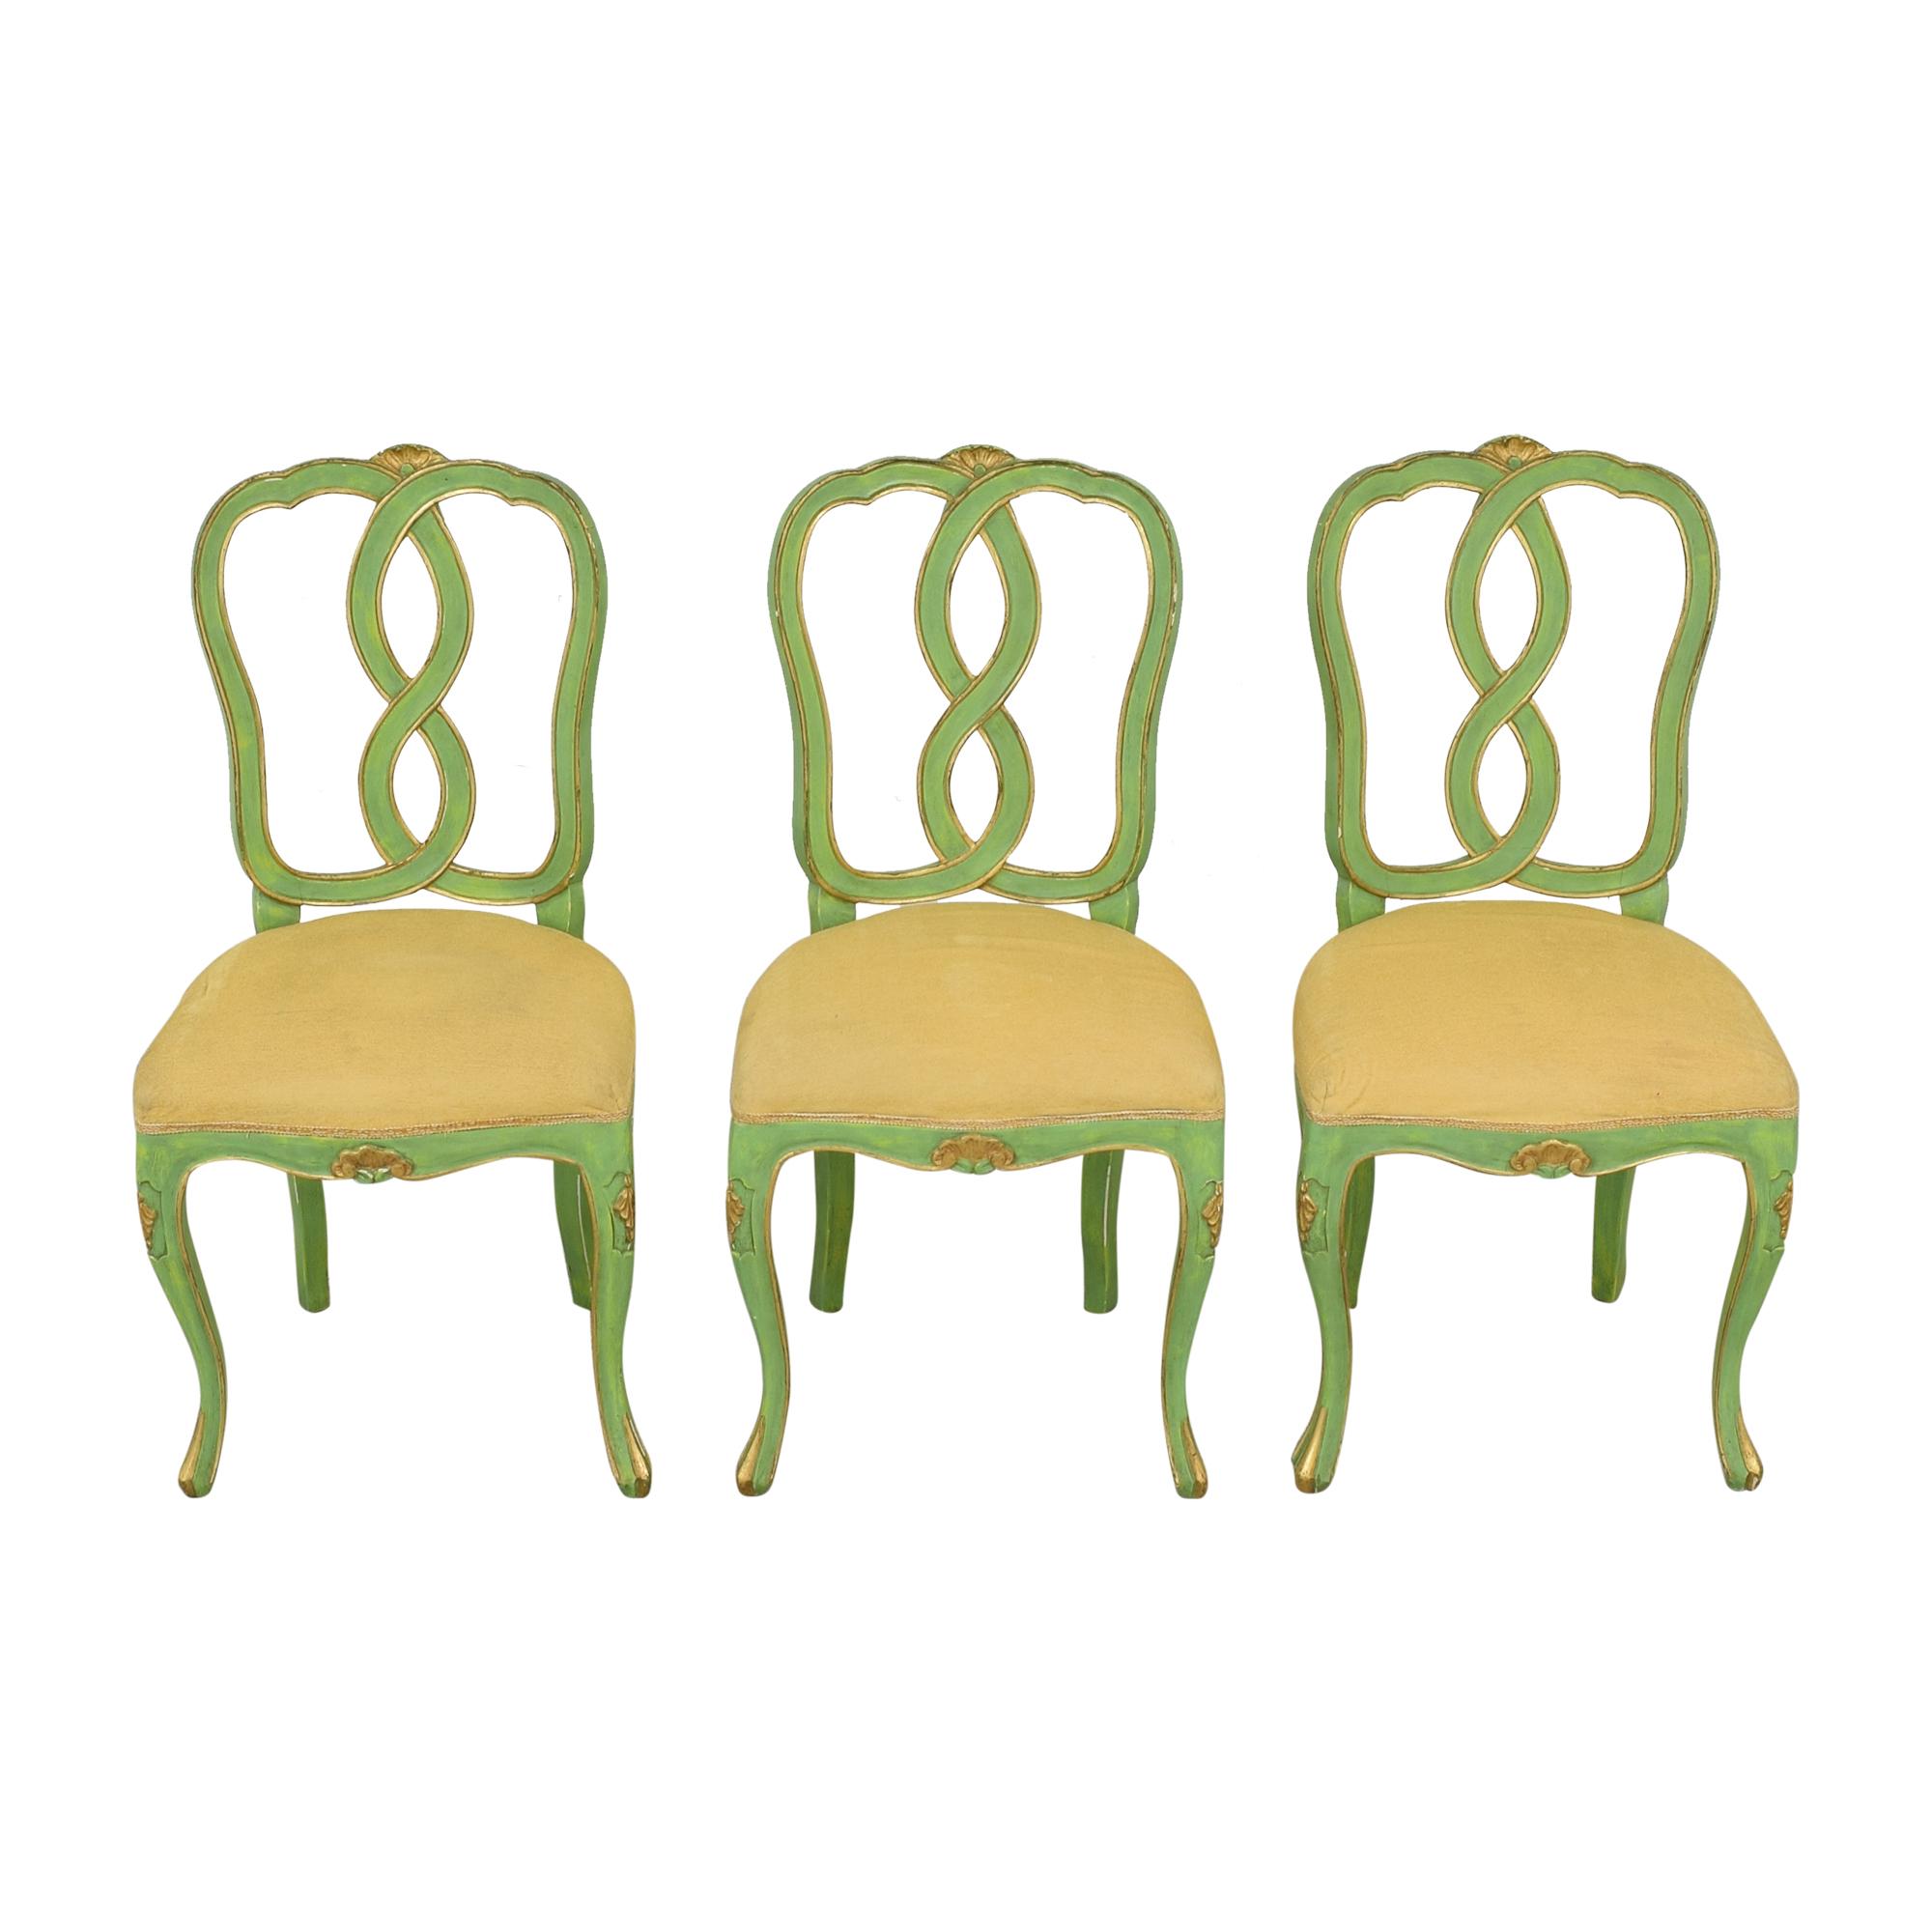 buy Bergdorf Goodman Green and Gold Chairs Bergdorf Goodman Chairs